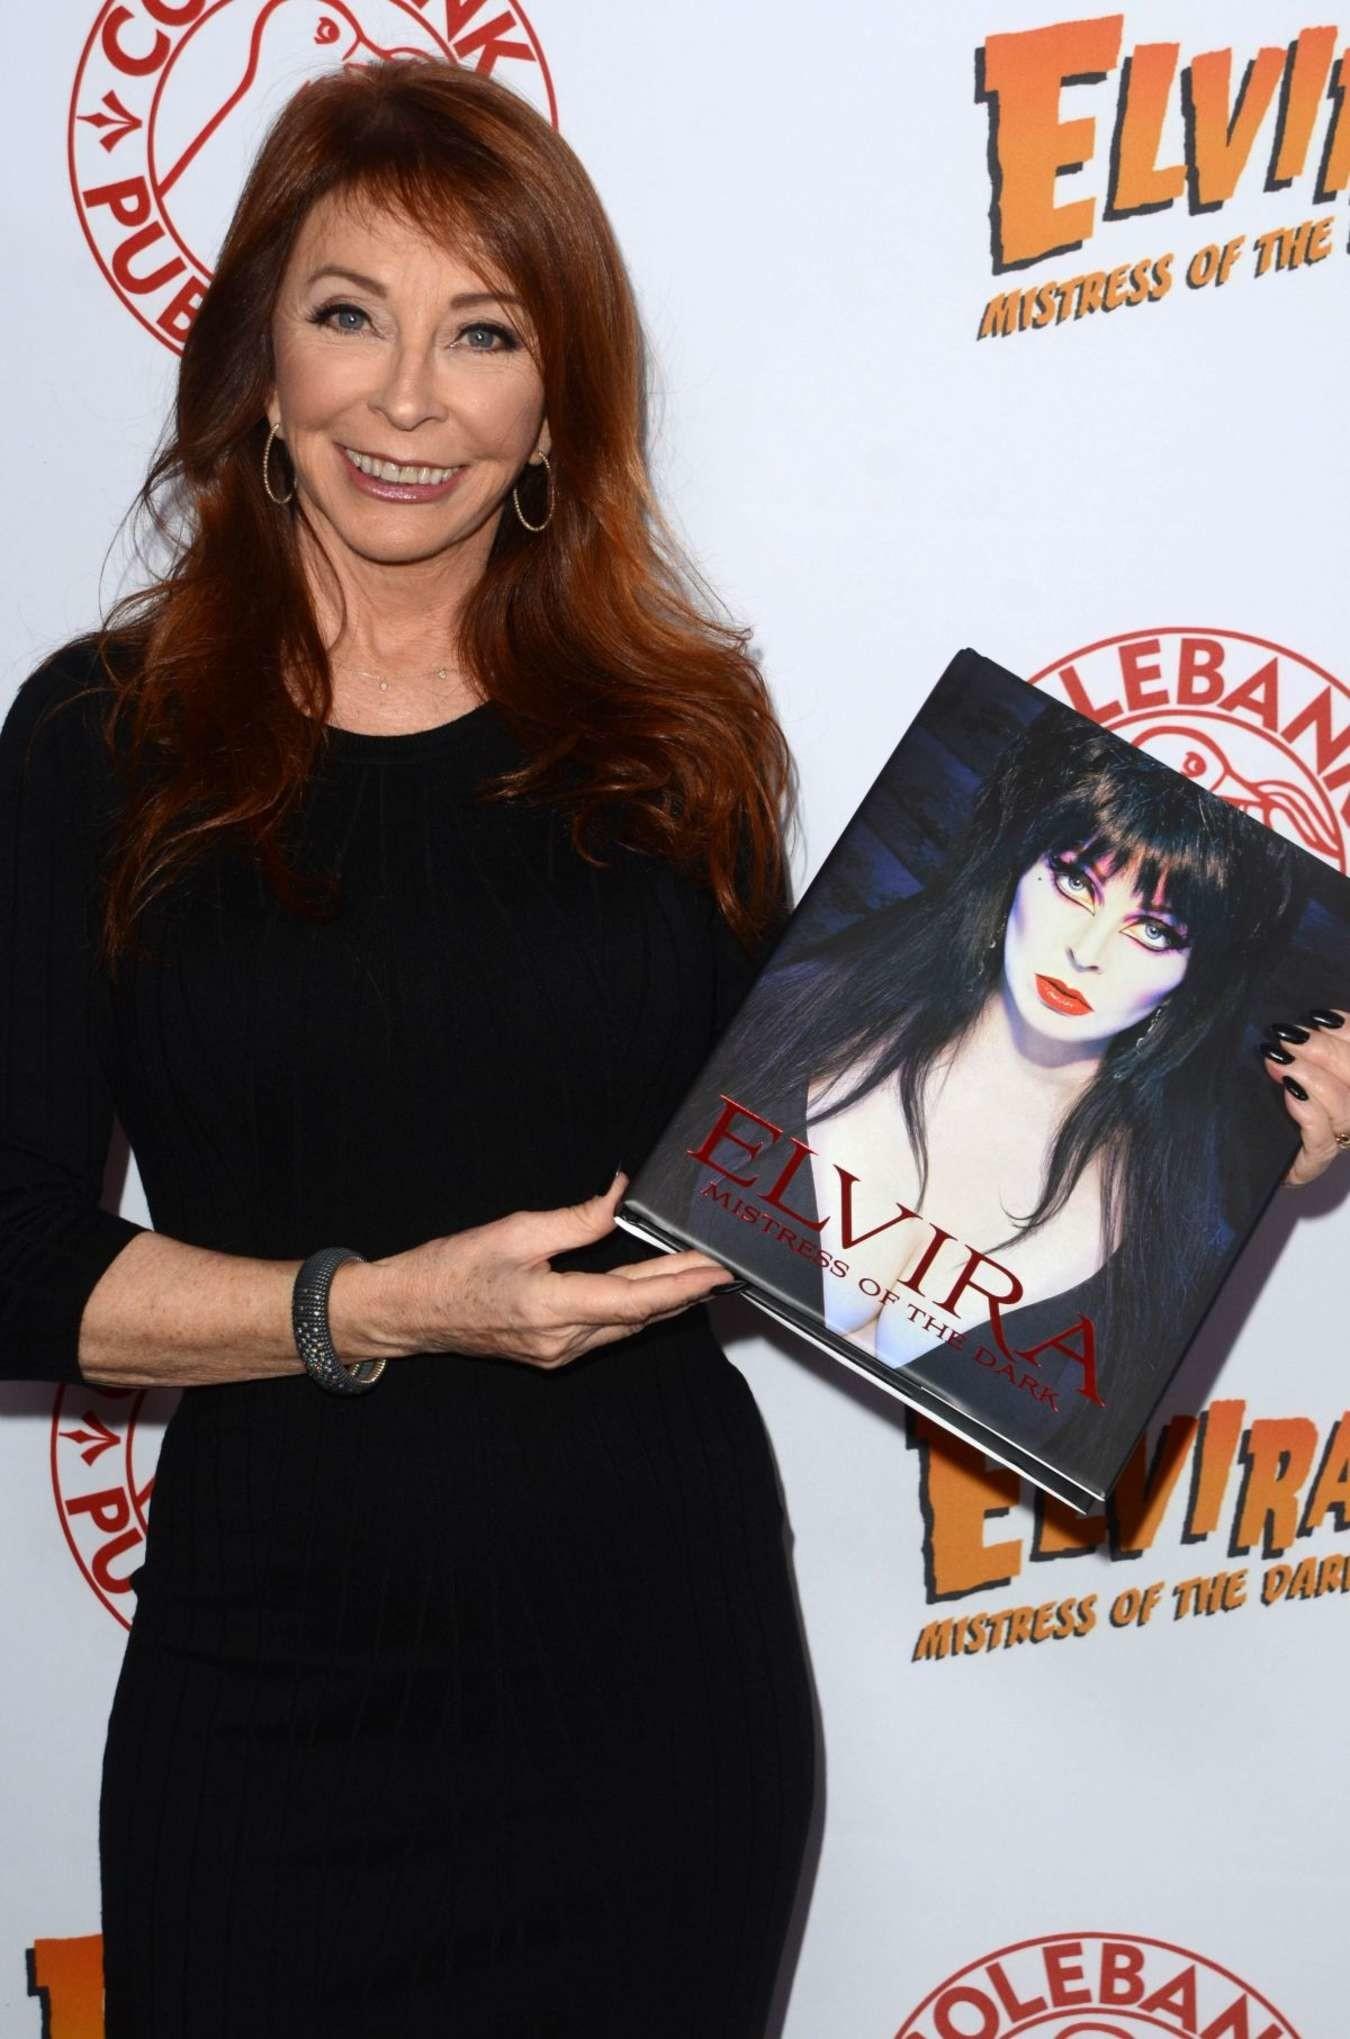 Cassandra Peterson: Elvira Mistress Of The Dark – Book Launch Party In LA